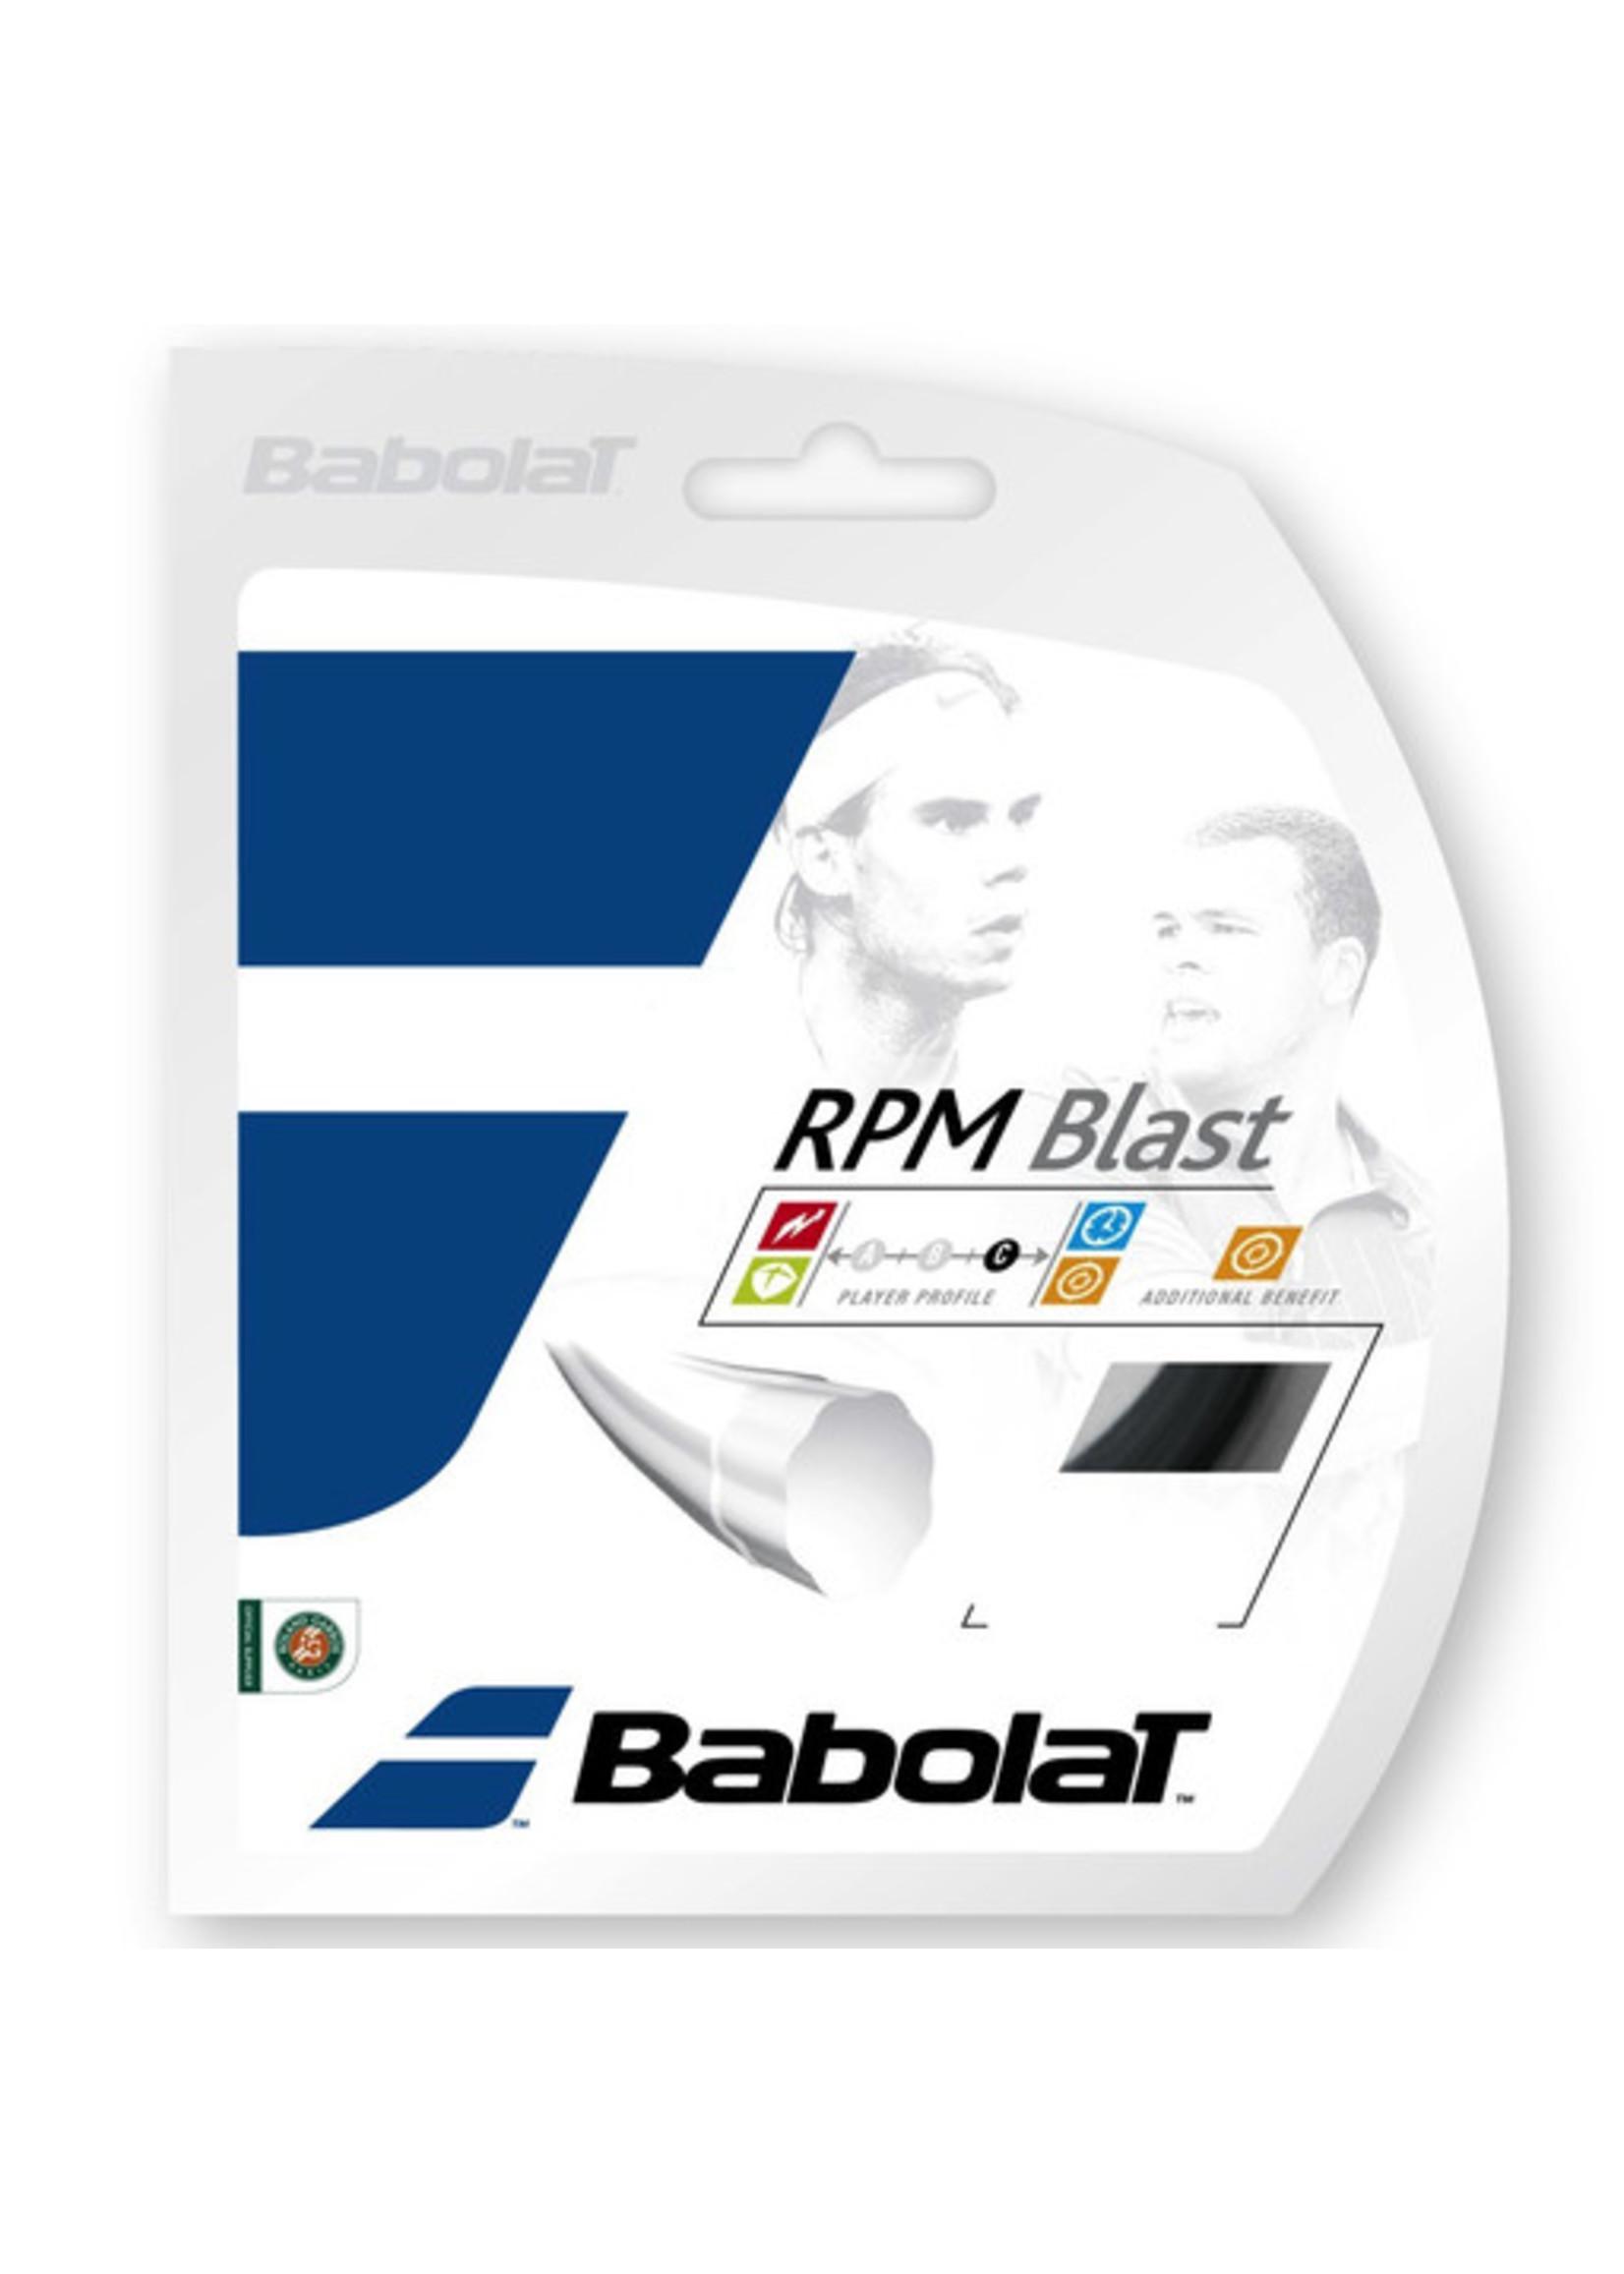 Babolat RPM Blast/Sensation Hybrid Tennis Restring